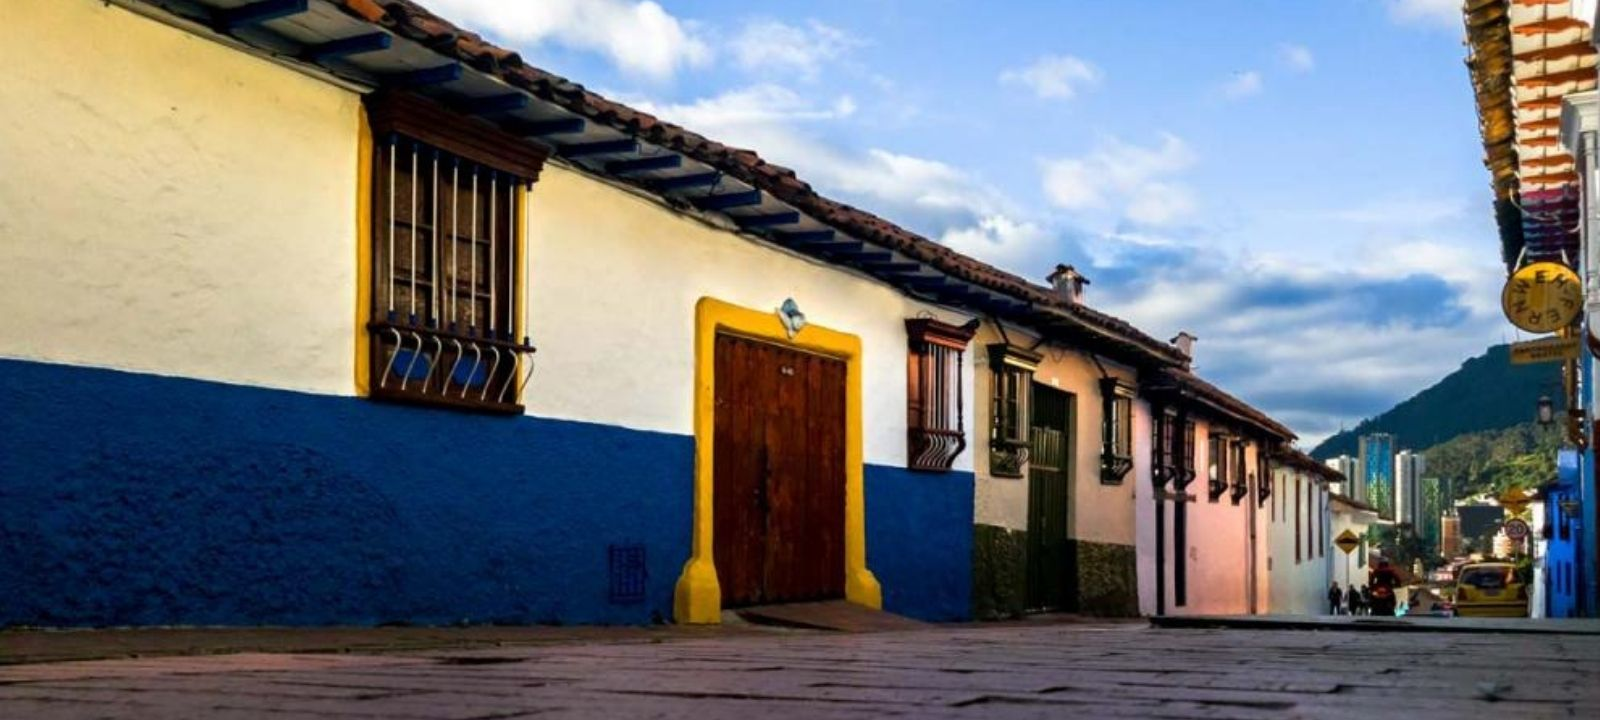 Barrio La Candelaria - Centro Histórico de Bogotá